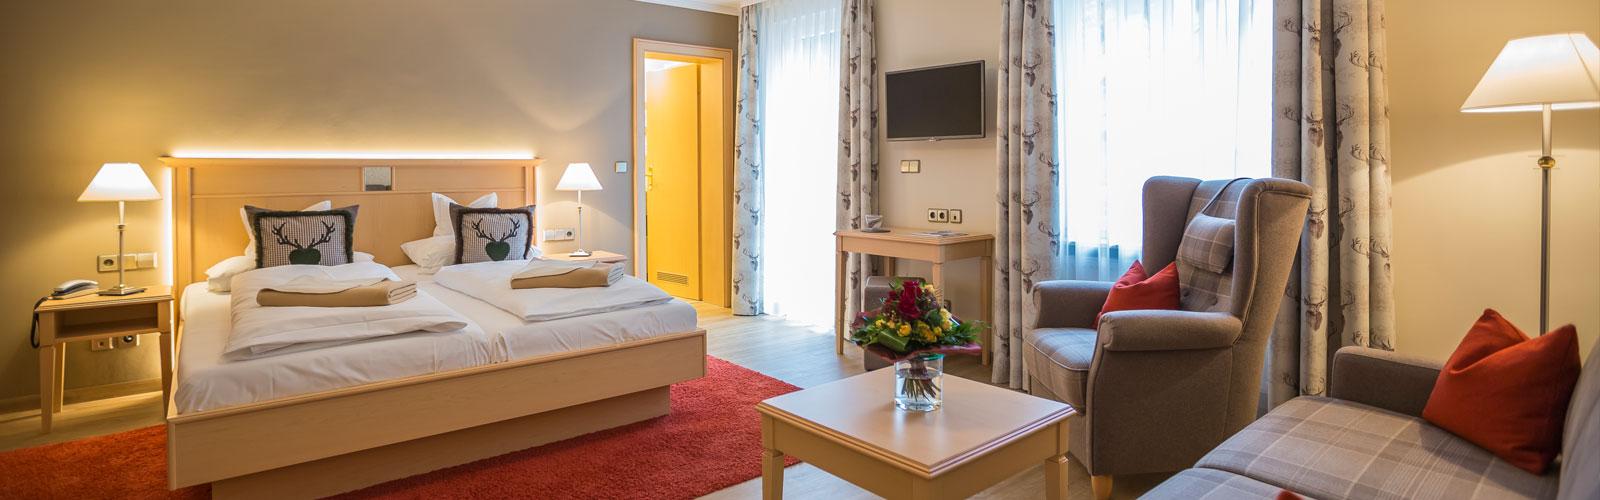 Adlerbad-Flair-Hotel-Zimmer19-1600x500px